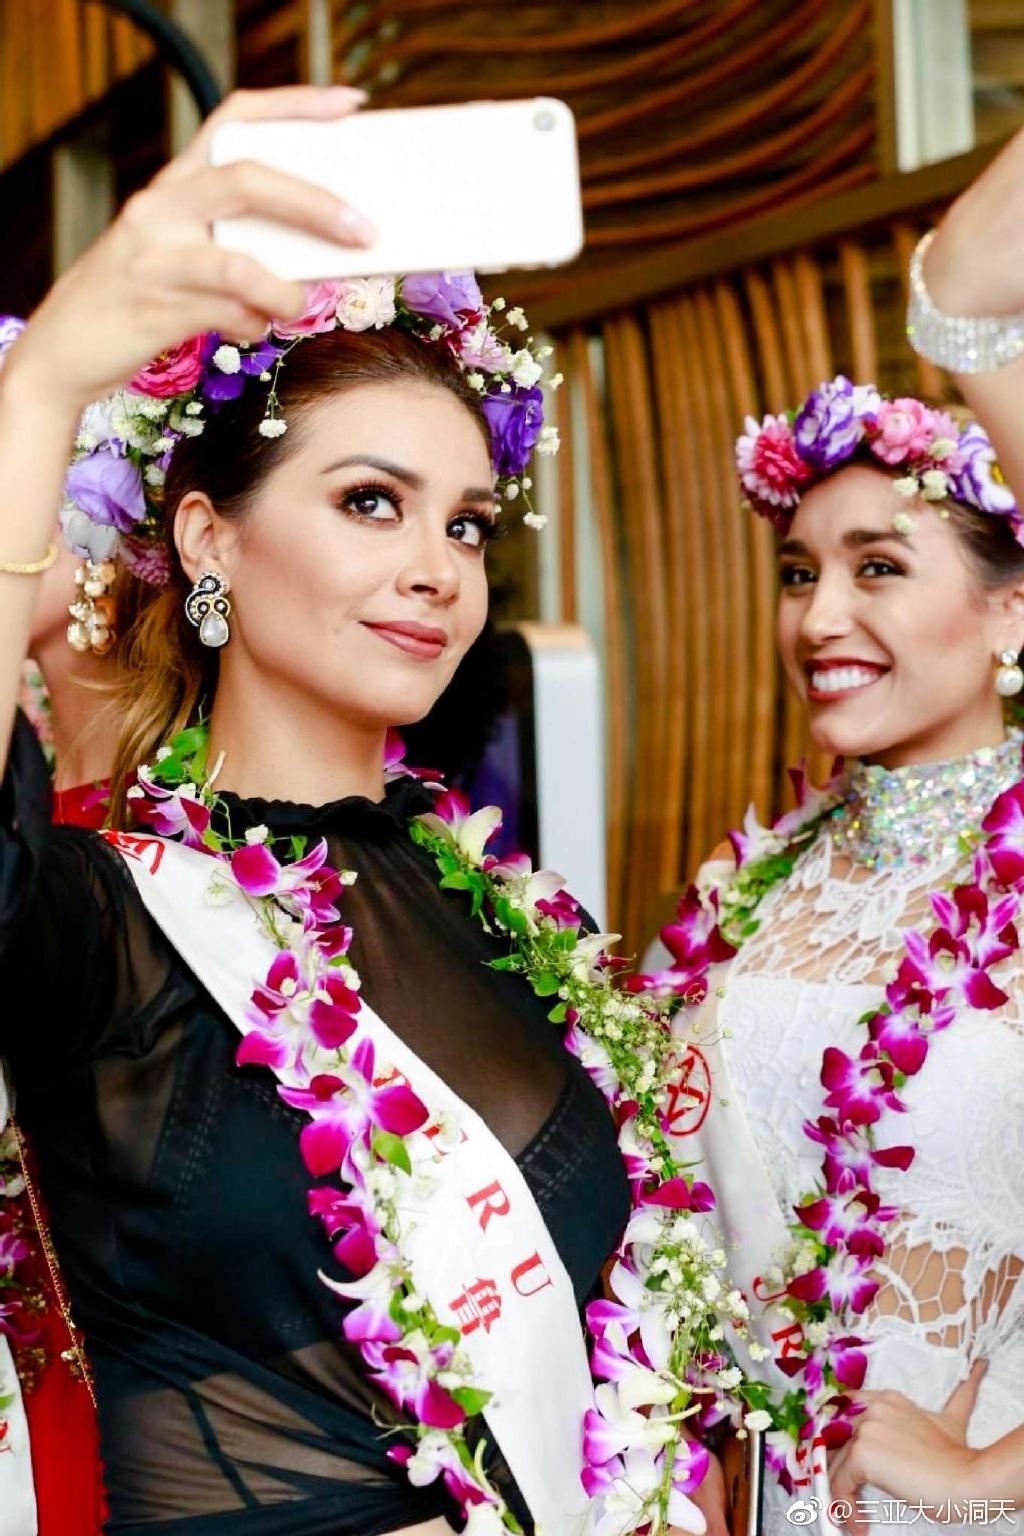 pamela sanchez, candidata a miss peru universo 2019/top 40 de miss world 2017. - Página 10 56163940_83716ee6gy1fl9j0ql4jmj211x1kwwqn